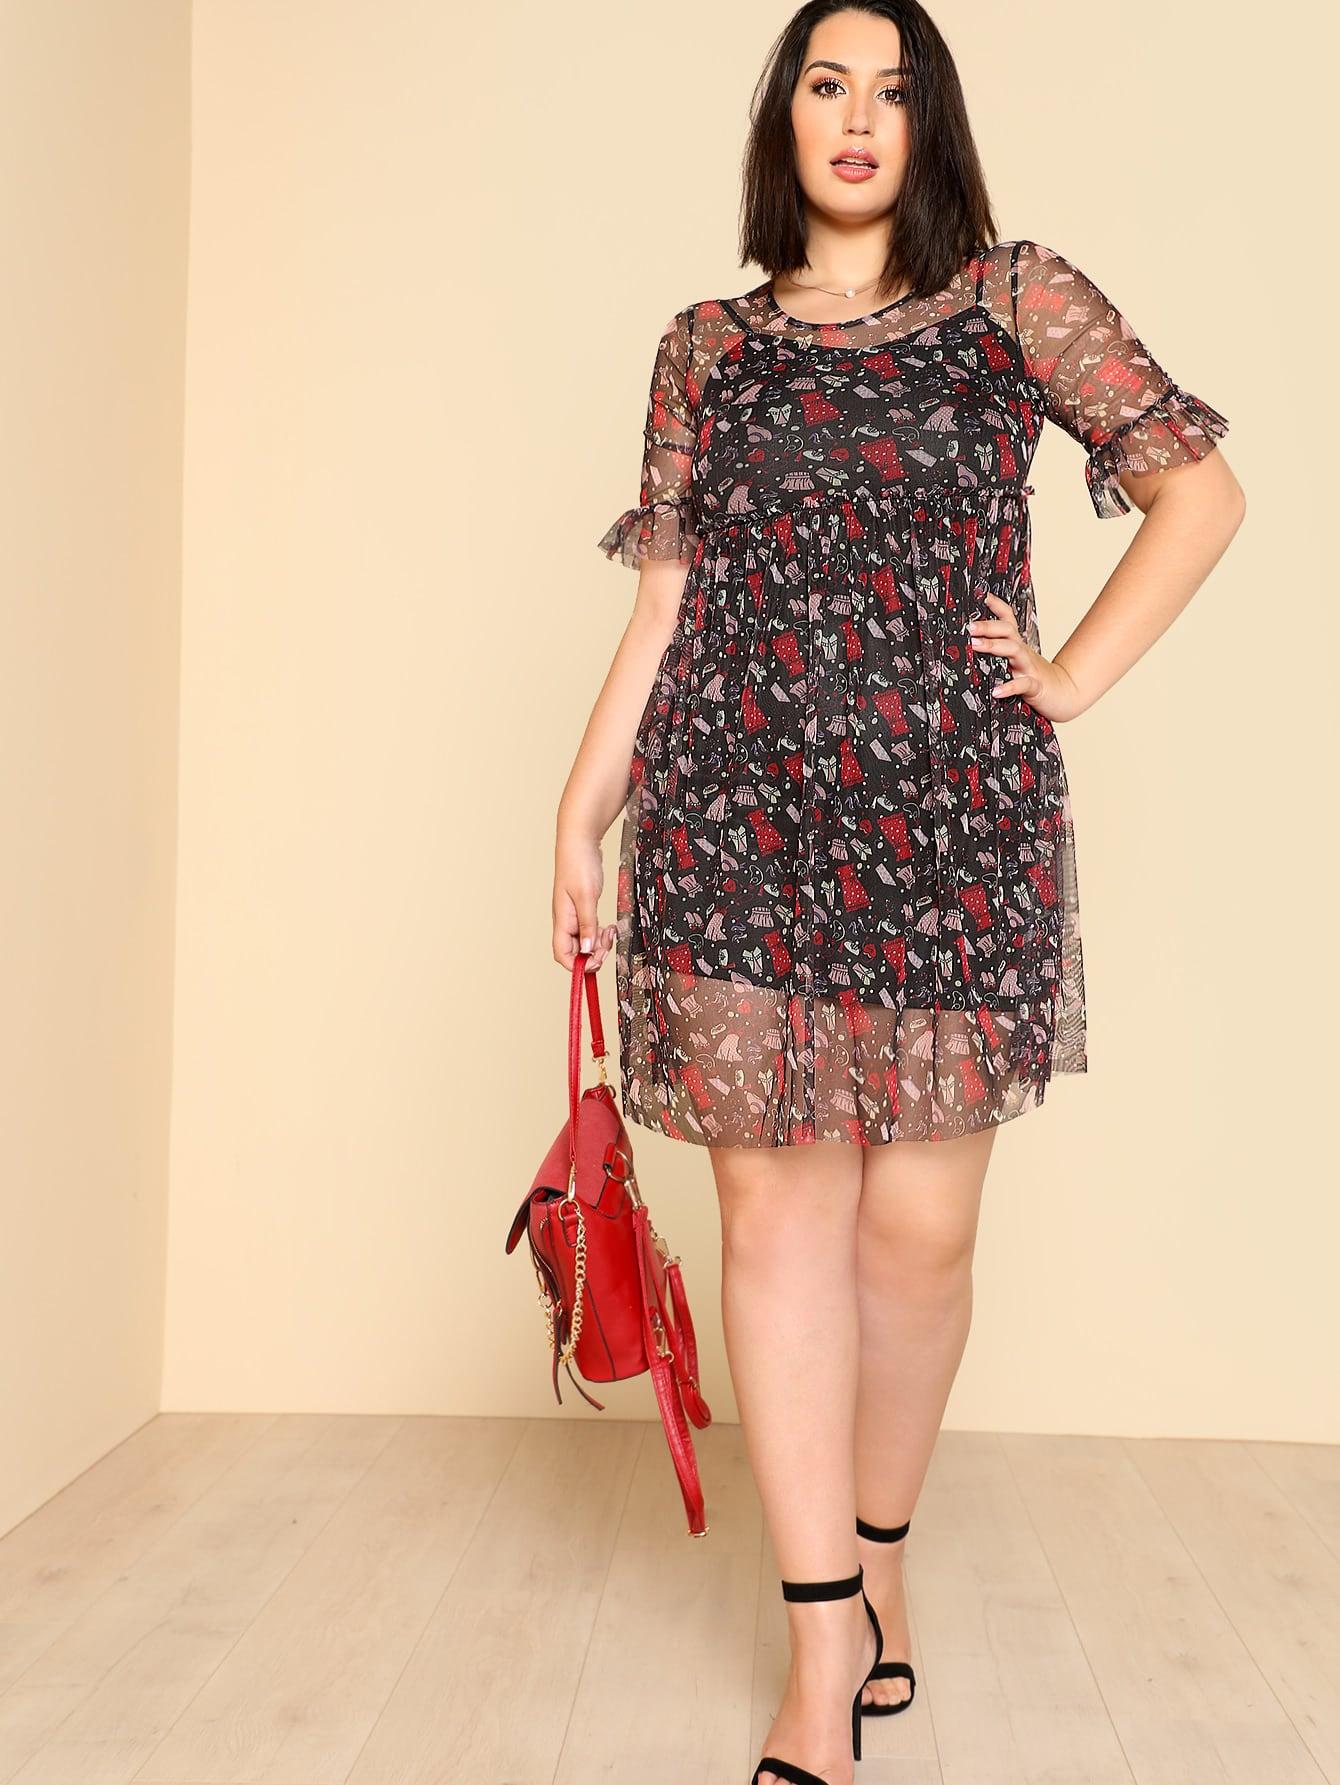 Ruffle Sleeve Mesh 2 In 1 Dress jessica farm 1